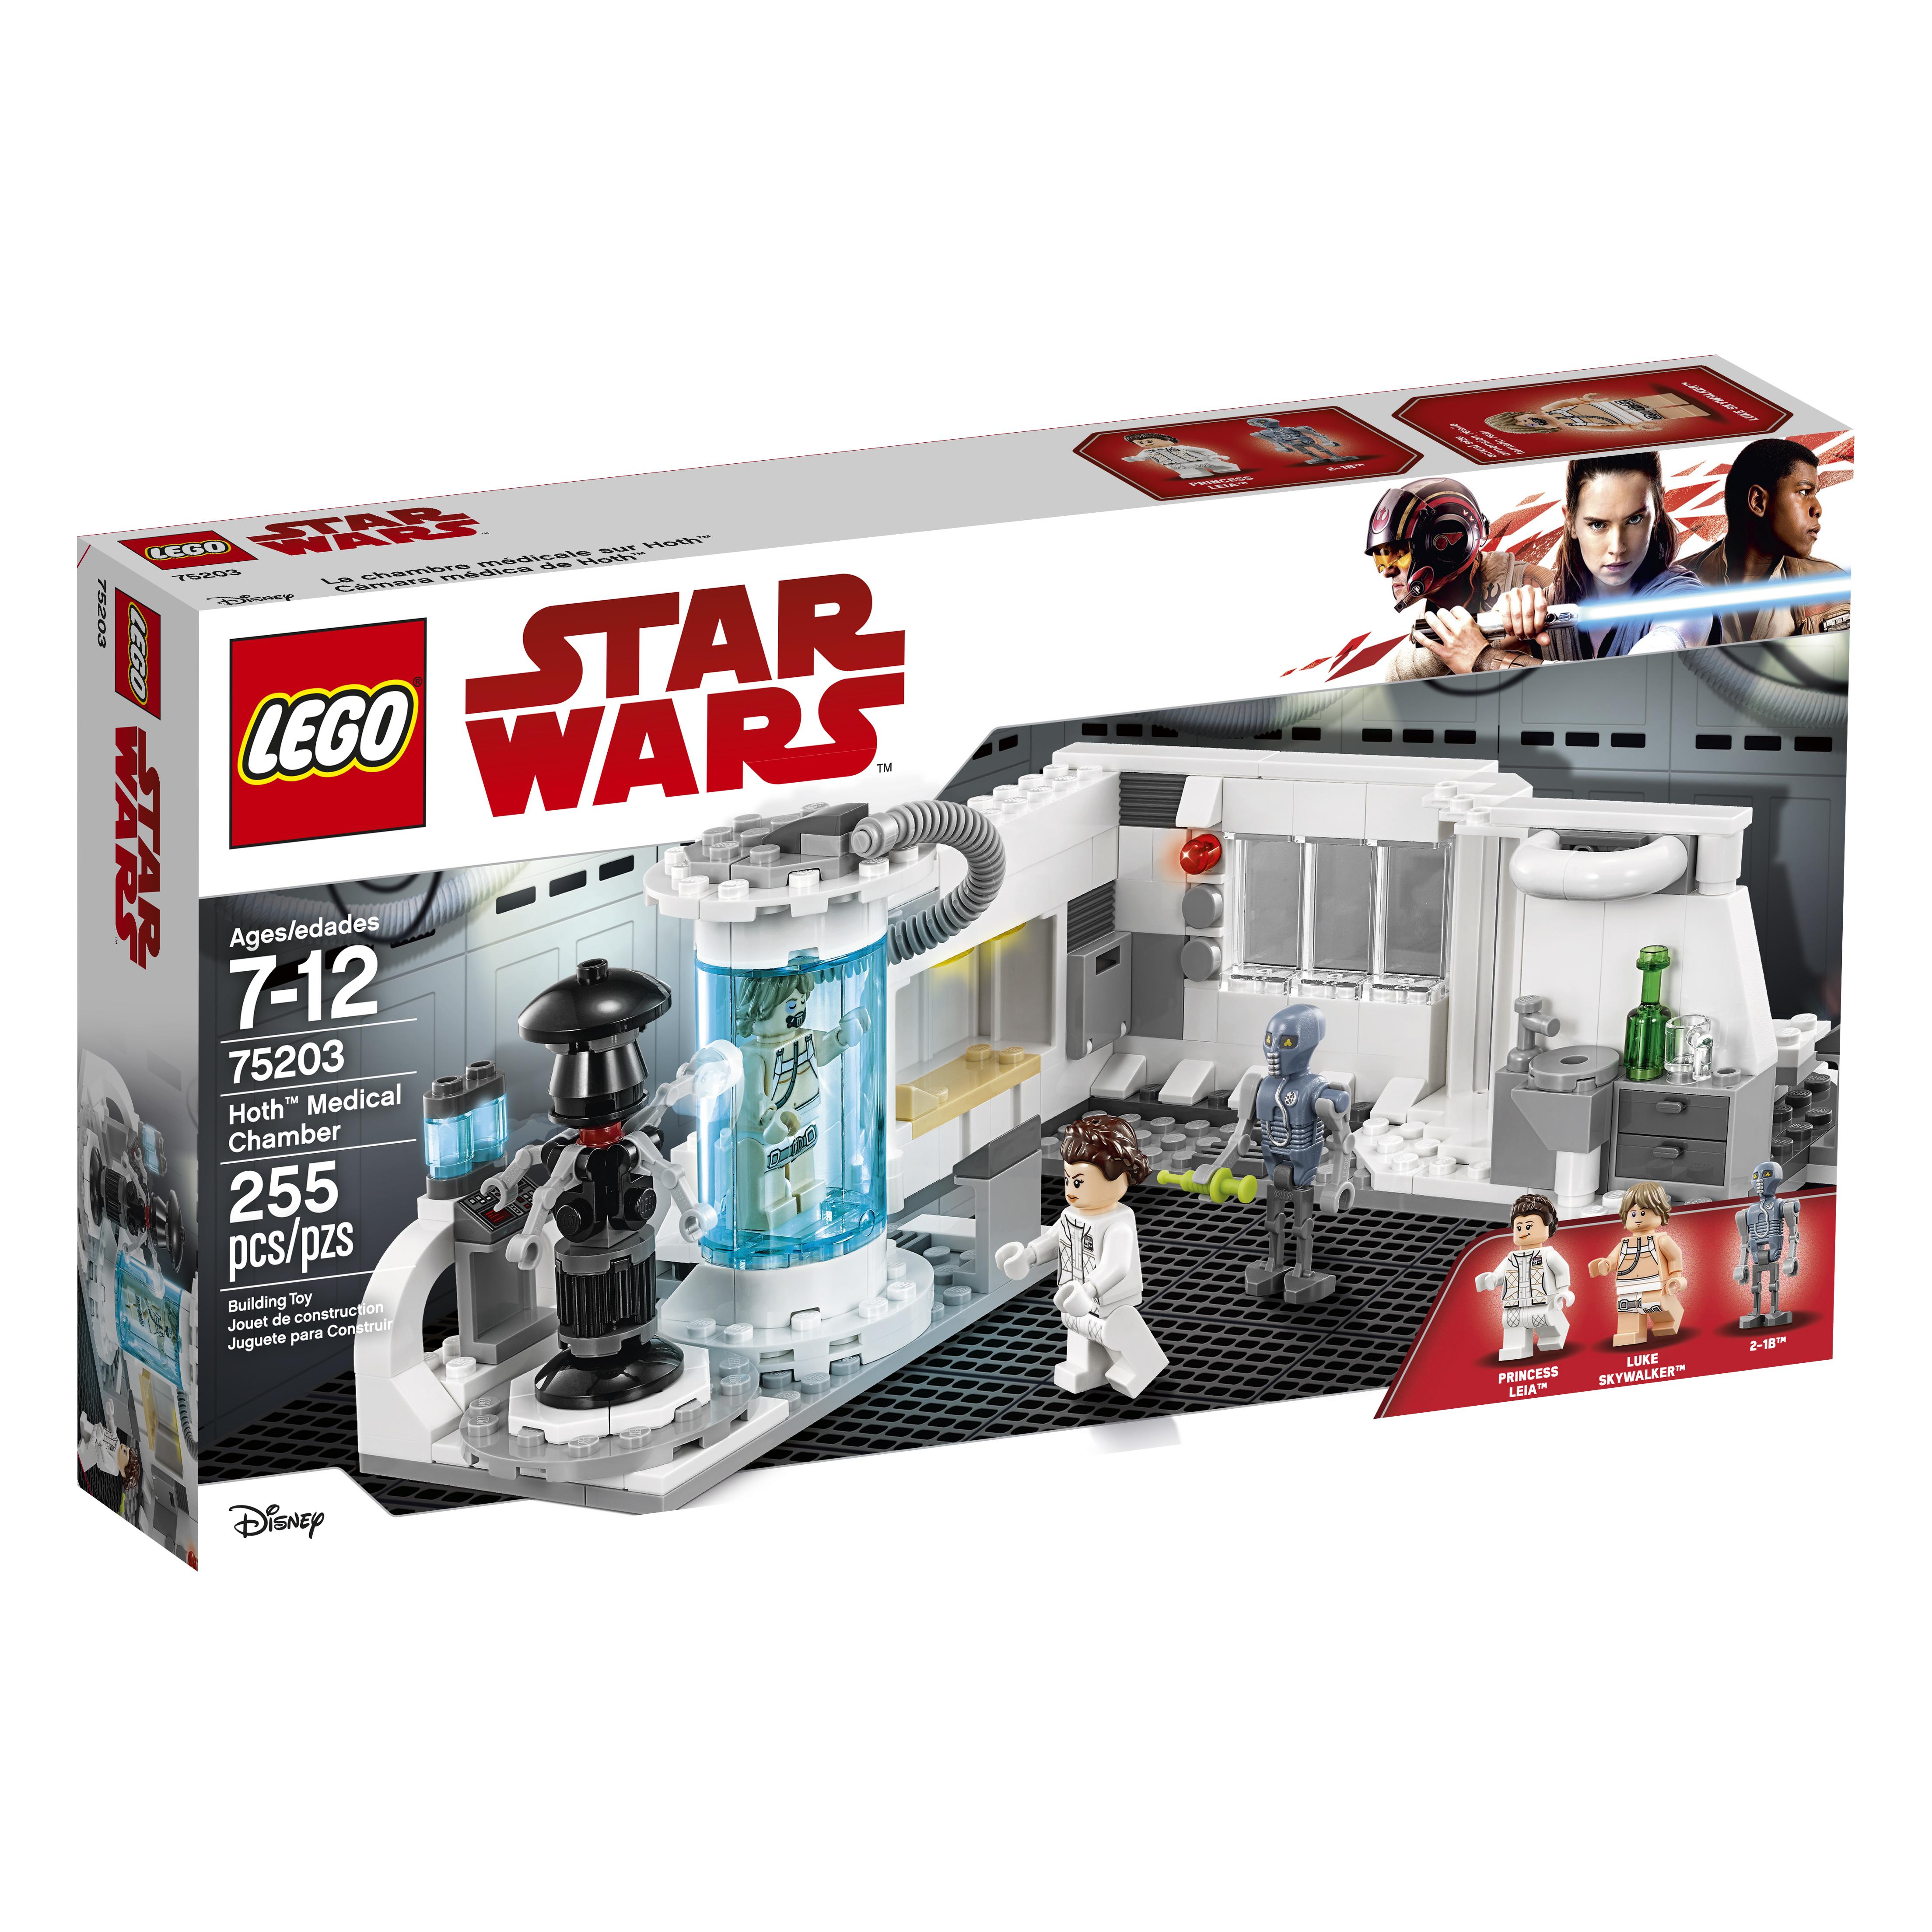 TLJ (TESB) Hoth Medical Chamber Lego Set 1